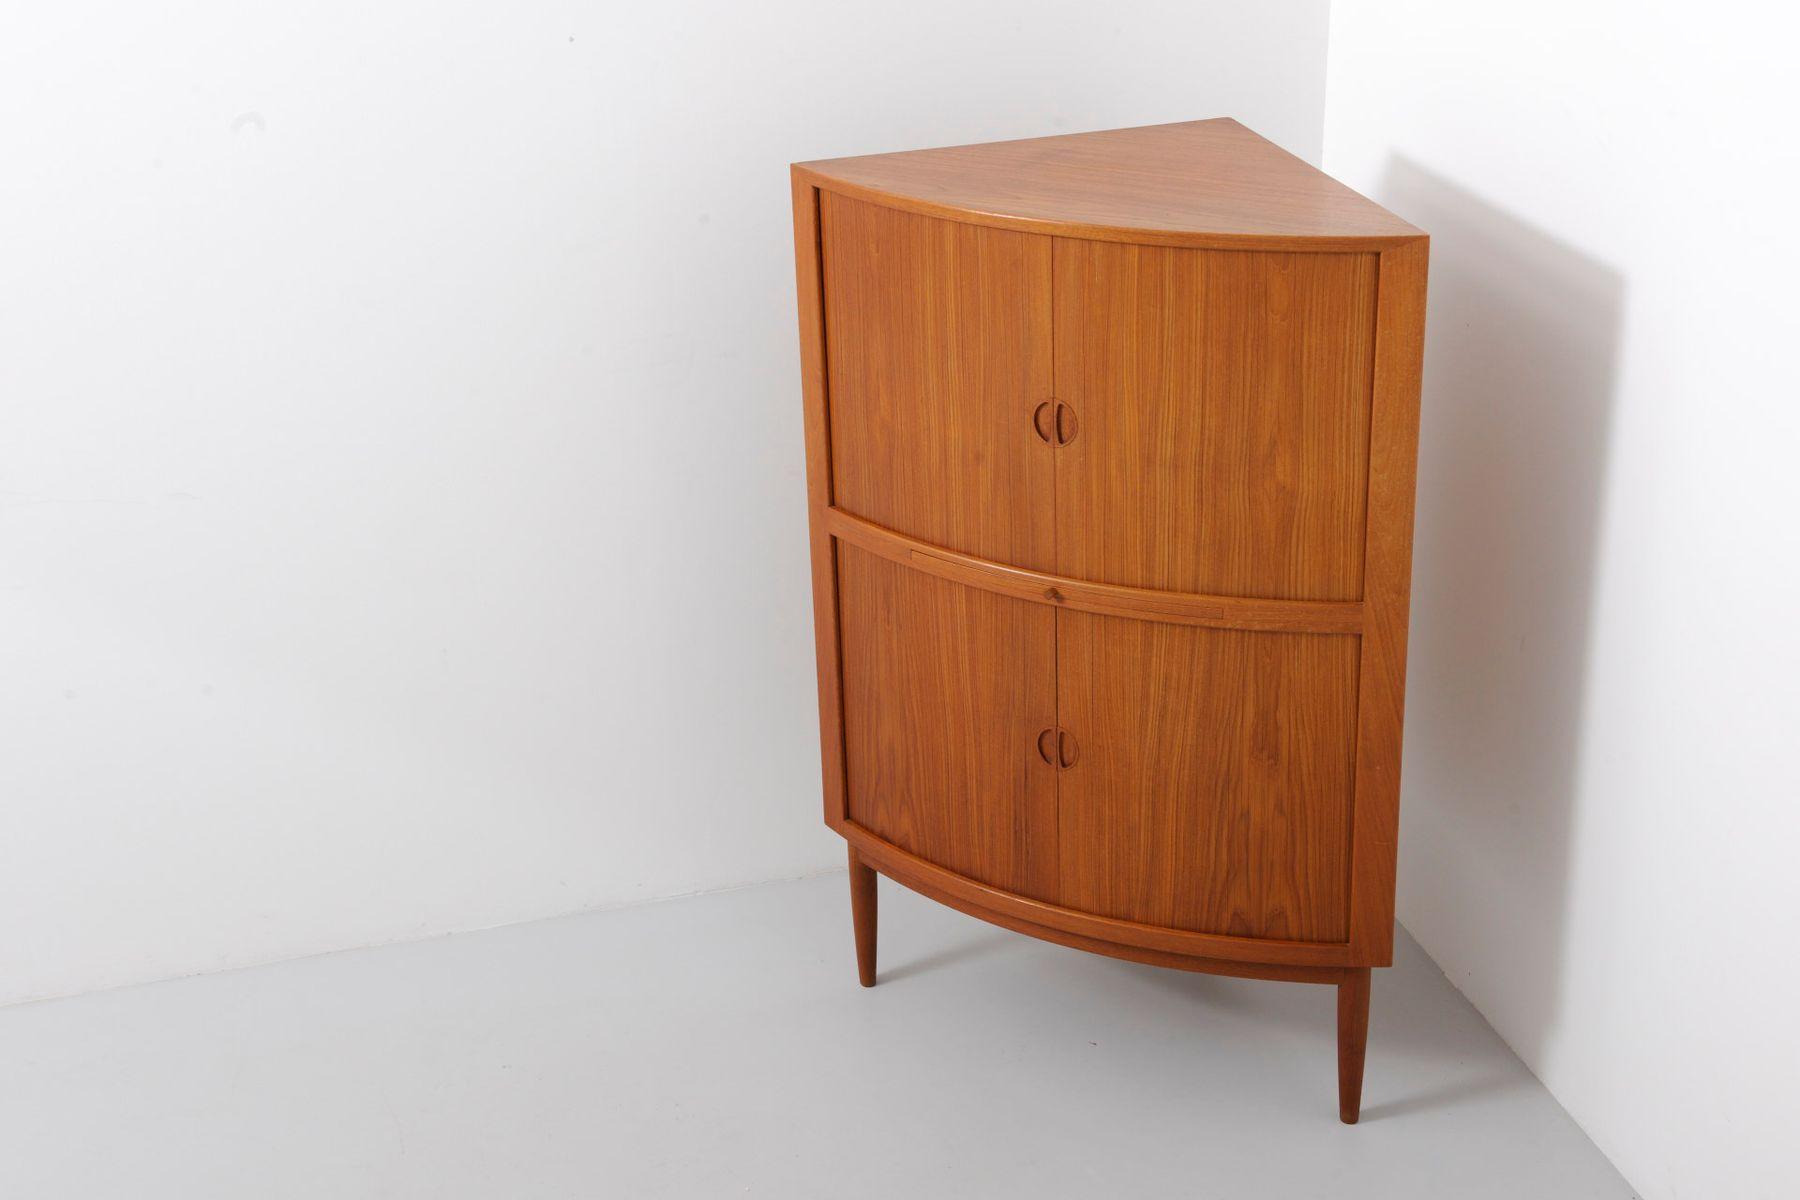 Vintage Corner Cabinet Vintage Teak Corner Cabinet With Tambour Doors For Sale At Pamono